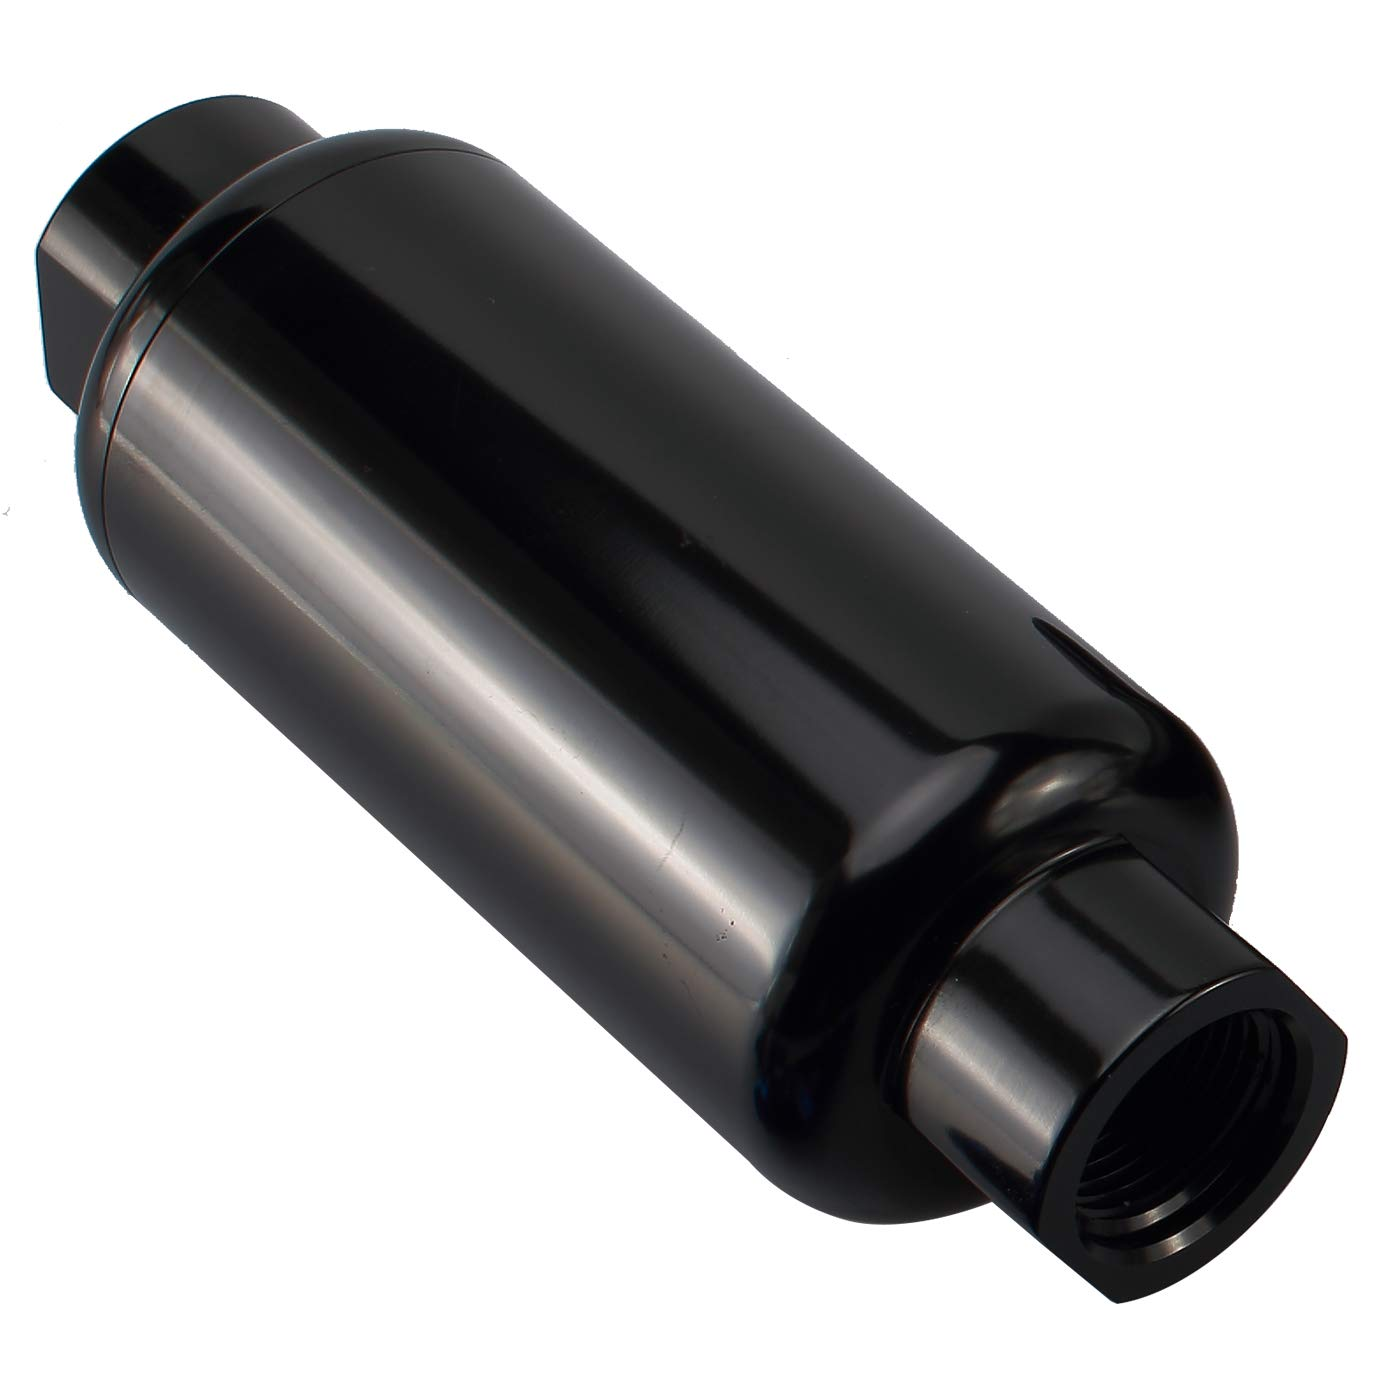 Brake Line Lock Shut Off Valve 1//8 NPT Billet Aluminium Fuel Flow Control Cut Off Valve Black Anodized